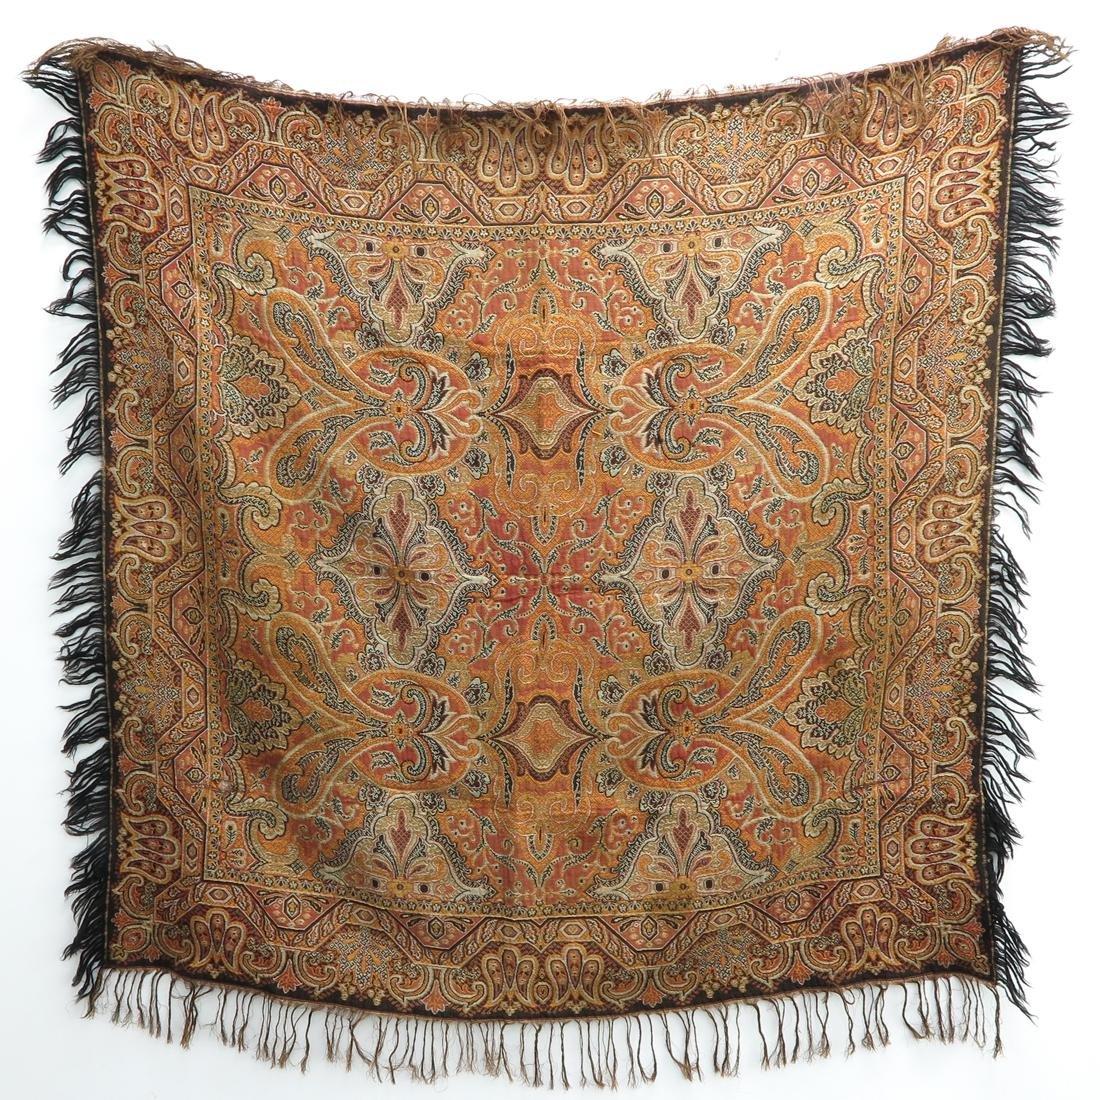 Fabric Covering or Worteldoek